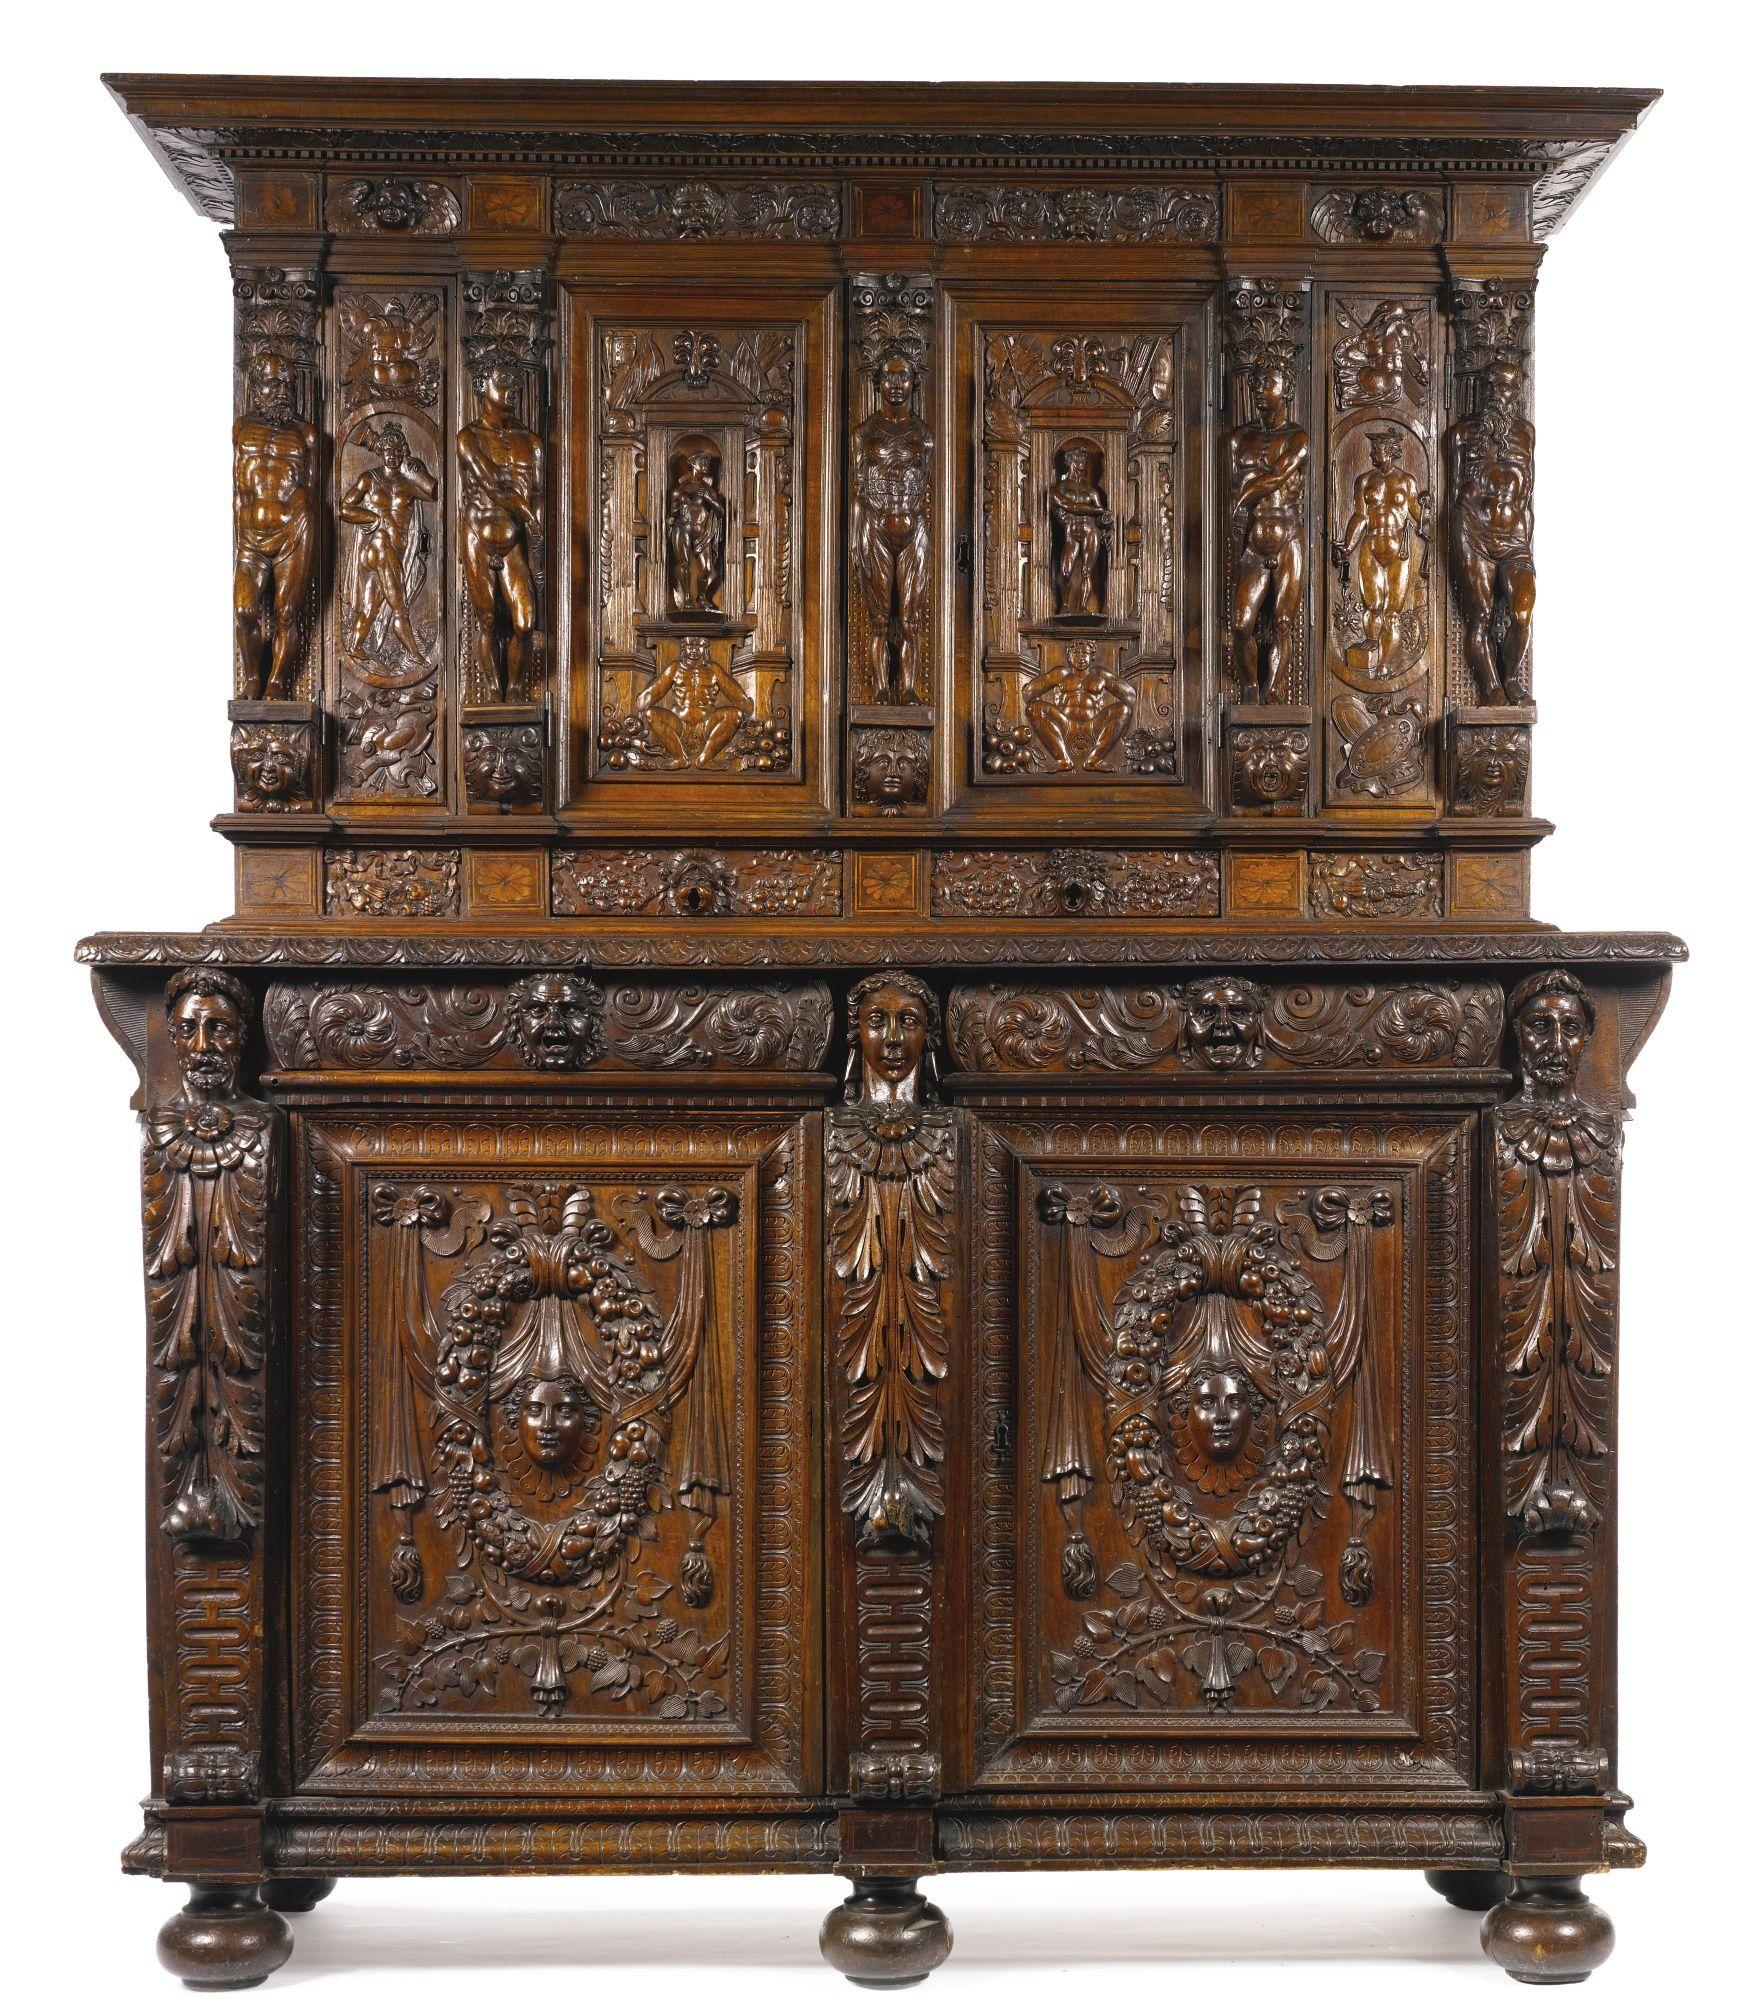 A French Renaissance Carved Walnut Buffet A Deux Corps Br Part 16th Century Lot Renaissance Furniture Baroque Furniture Carved Furniture